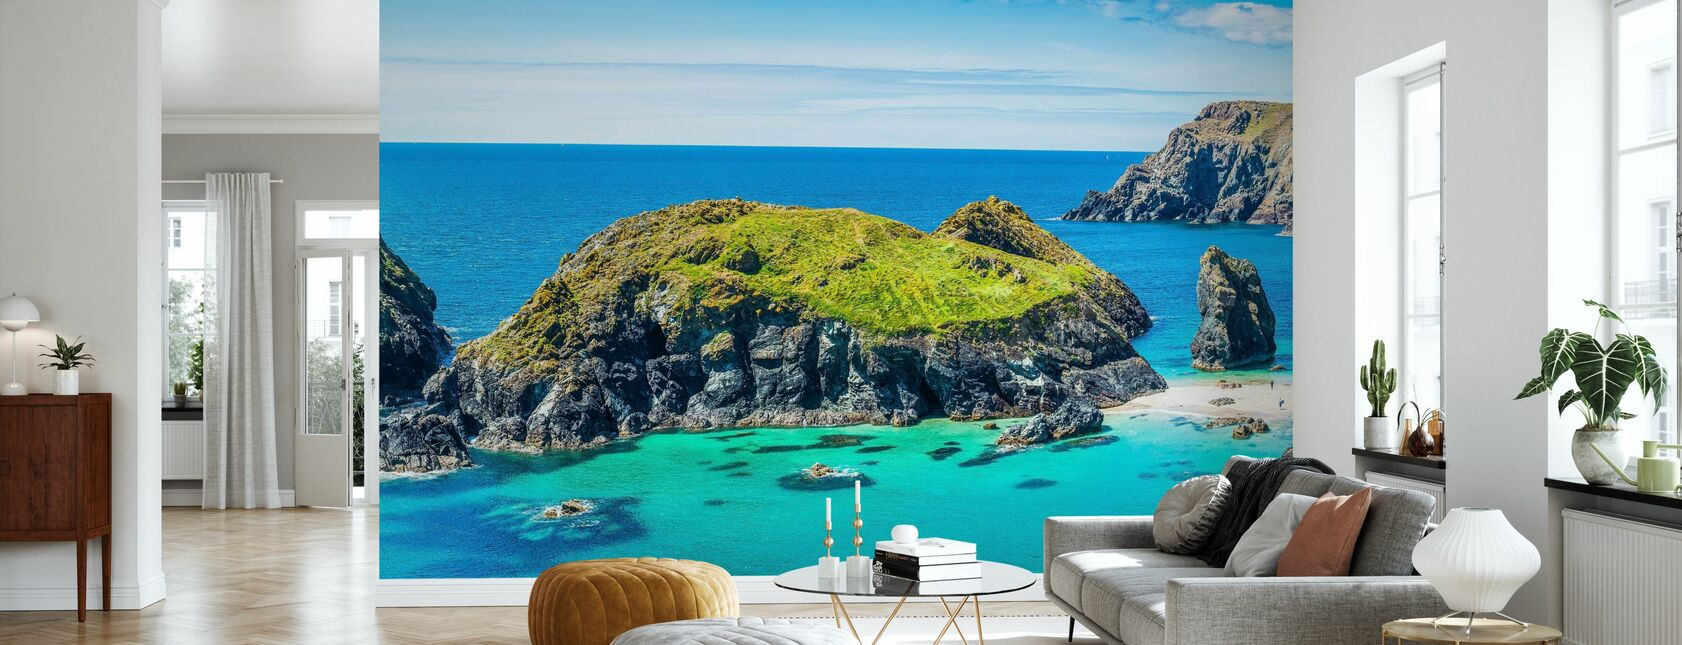 Cornwall Ocean Bay - Wallpaper - Living Room